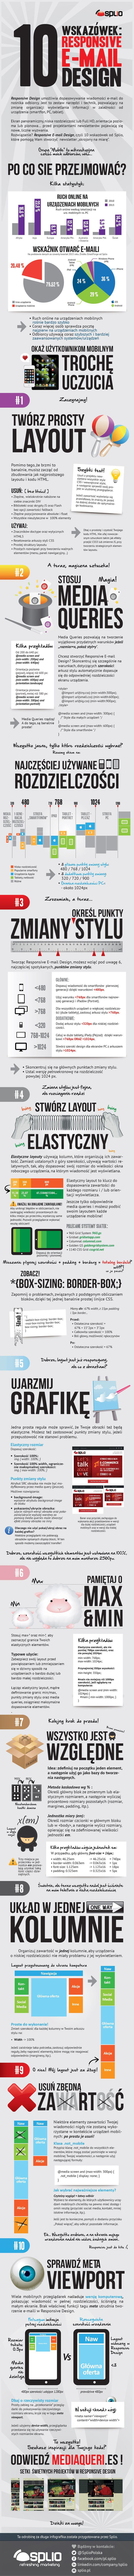 #responsive #email #design - Splio's #infographic